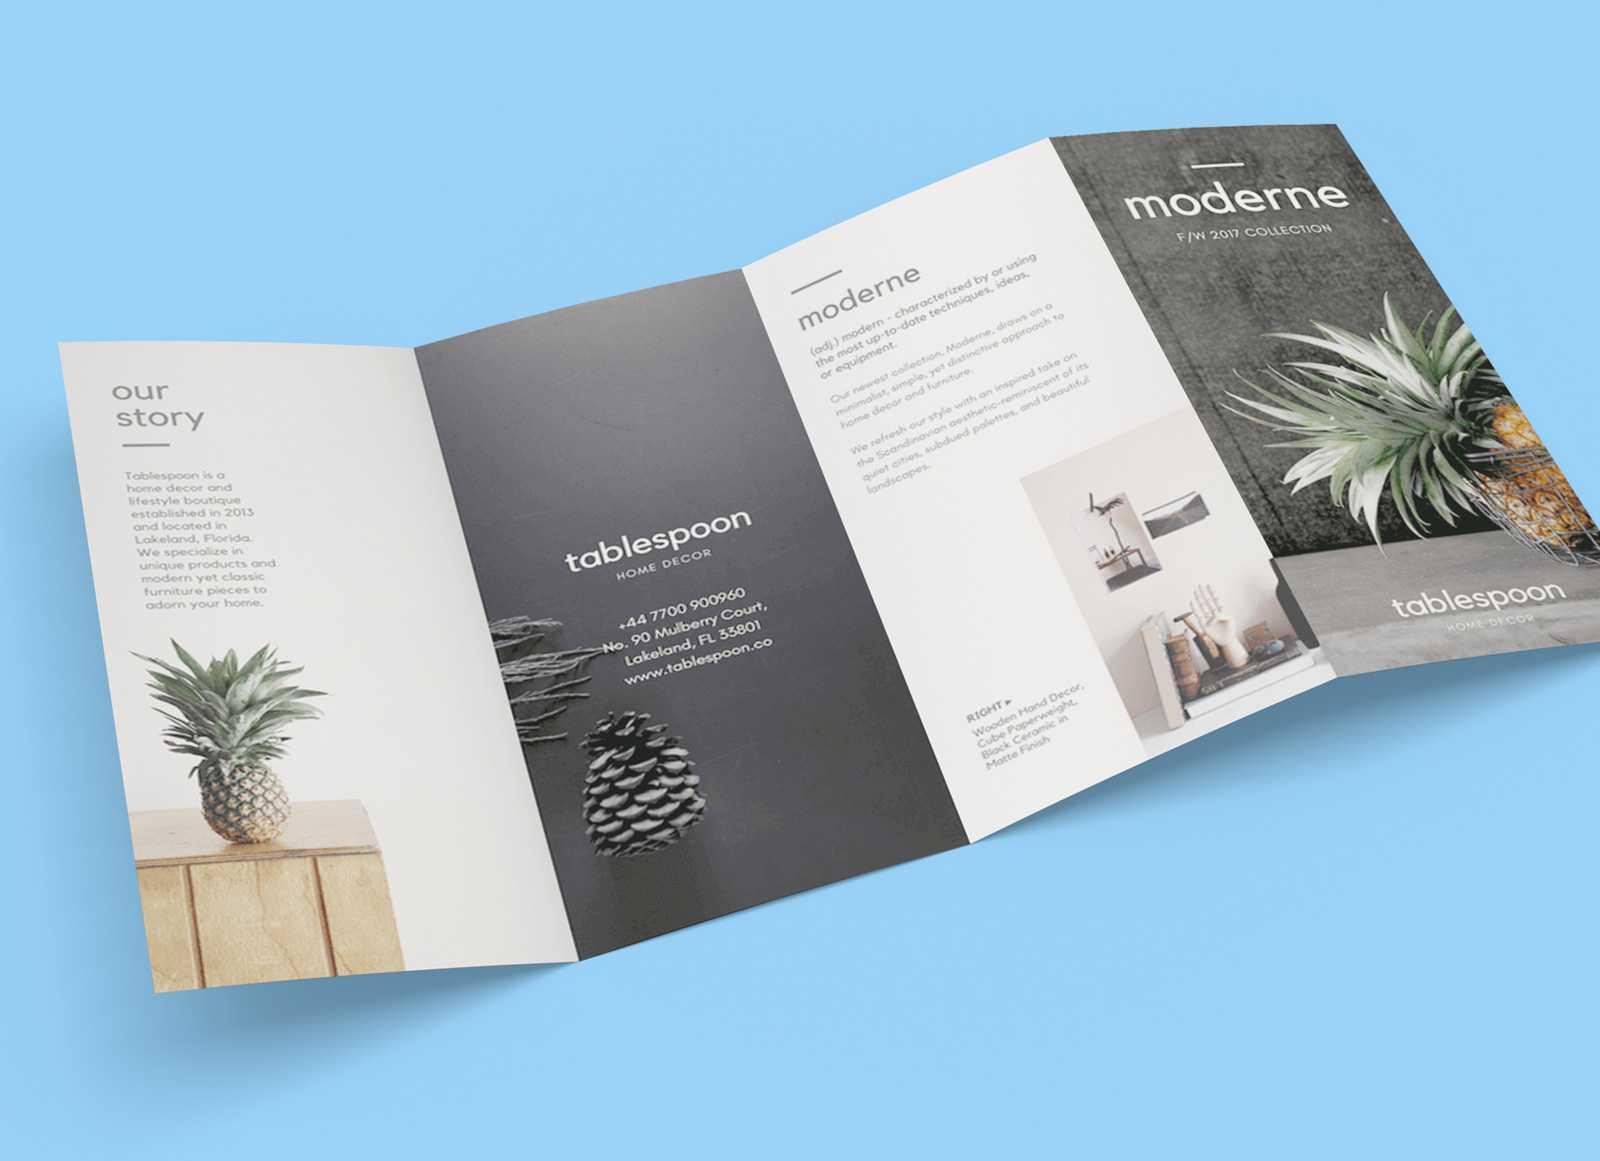 Free 4 Panel Quad Fold Brochure Mockup Psd - Good Mockups Inside 4 Fold Brochure Template